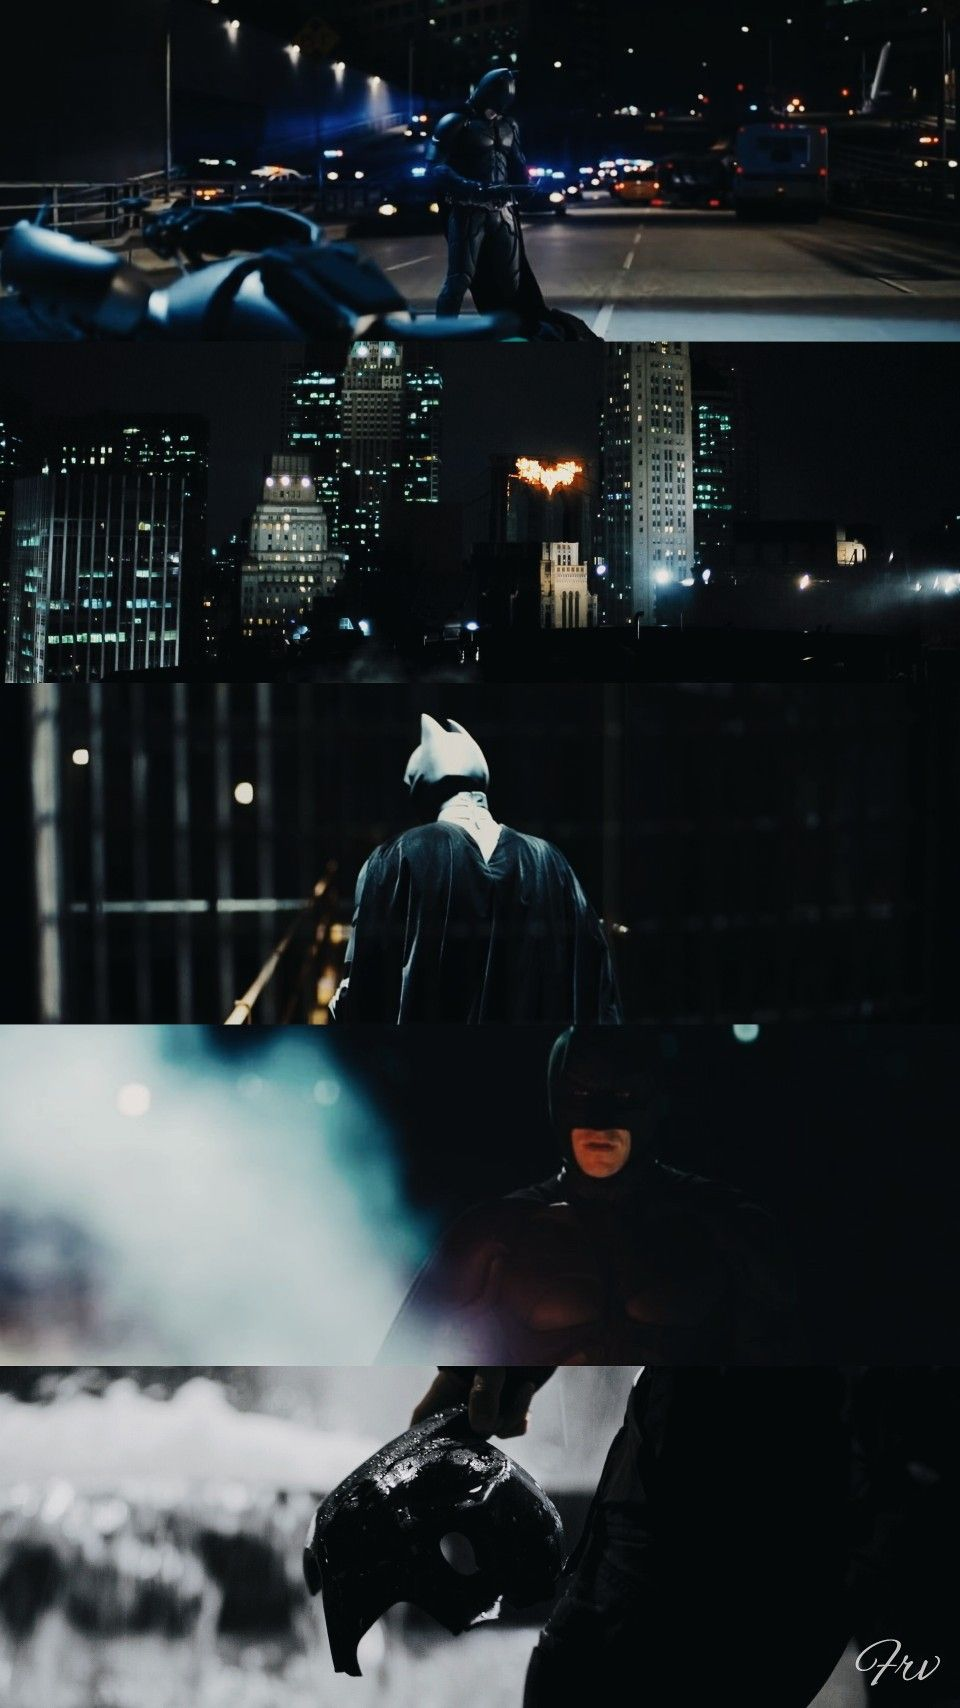 The Dark Knight Rises Cinematography Wallpapers Aesthetic The Dark Knight Rises Dark Knight Batman The Dark Knight The dark knight rises batman wallpaper